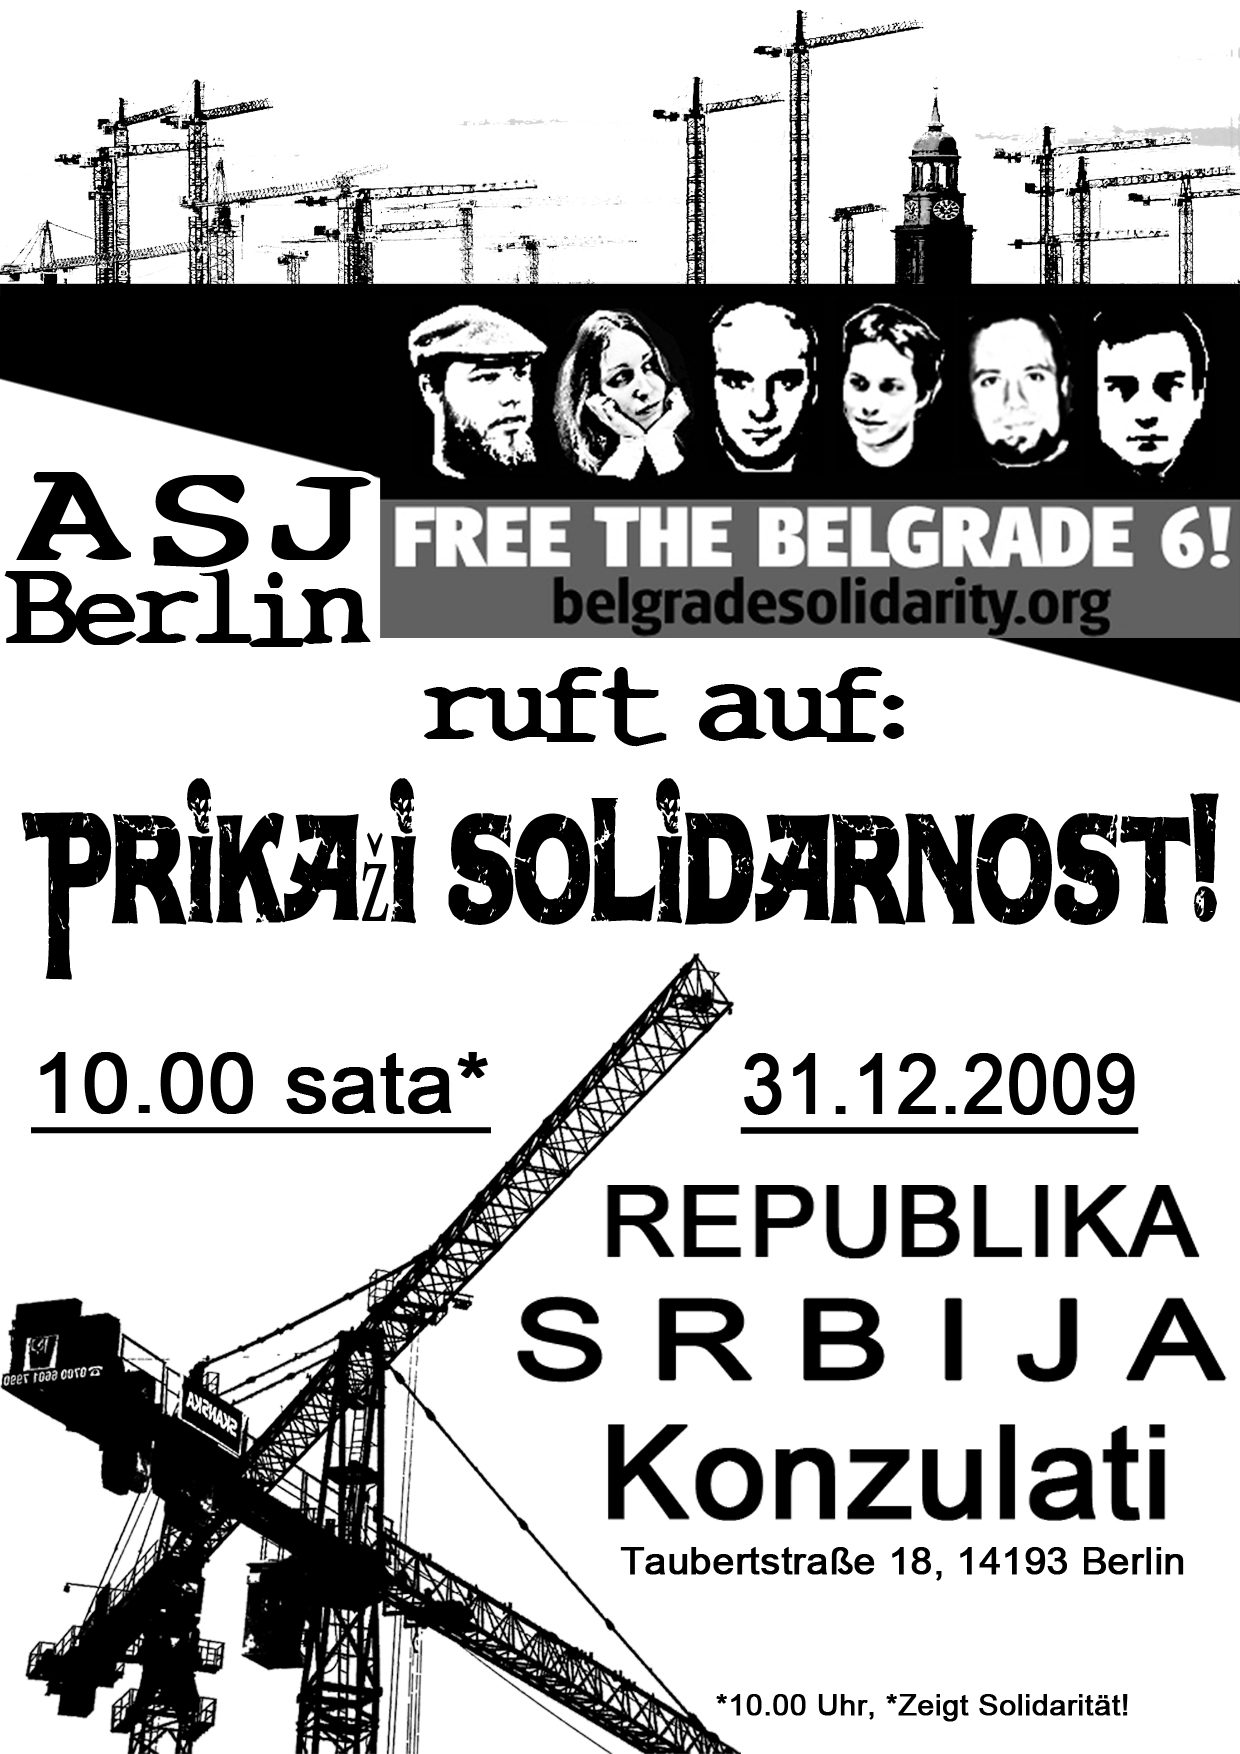 Kundgebung 31.12.2009